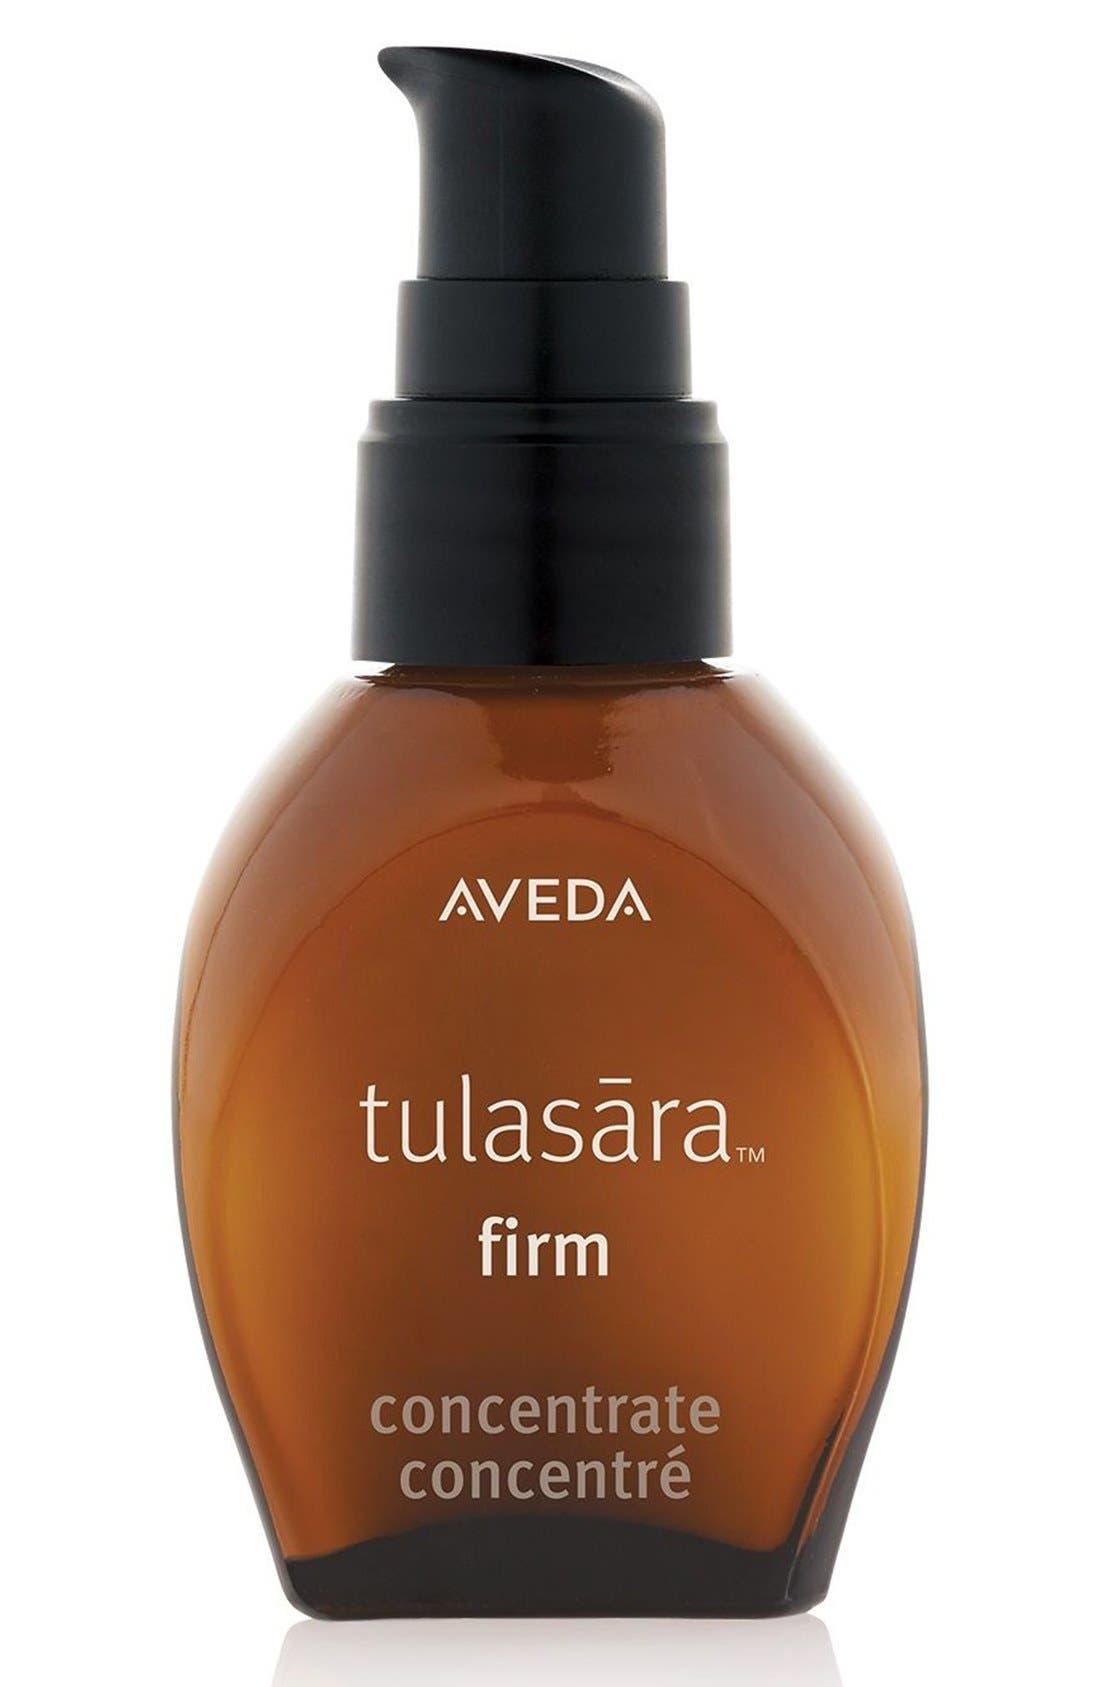 Tulasara(TM) Firm Concentrate